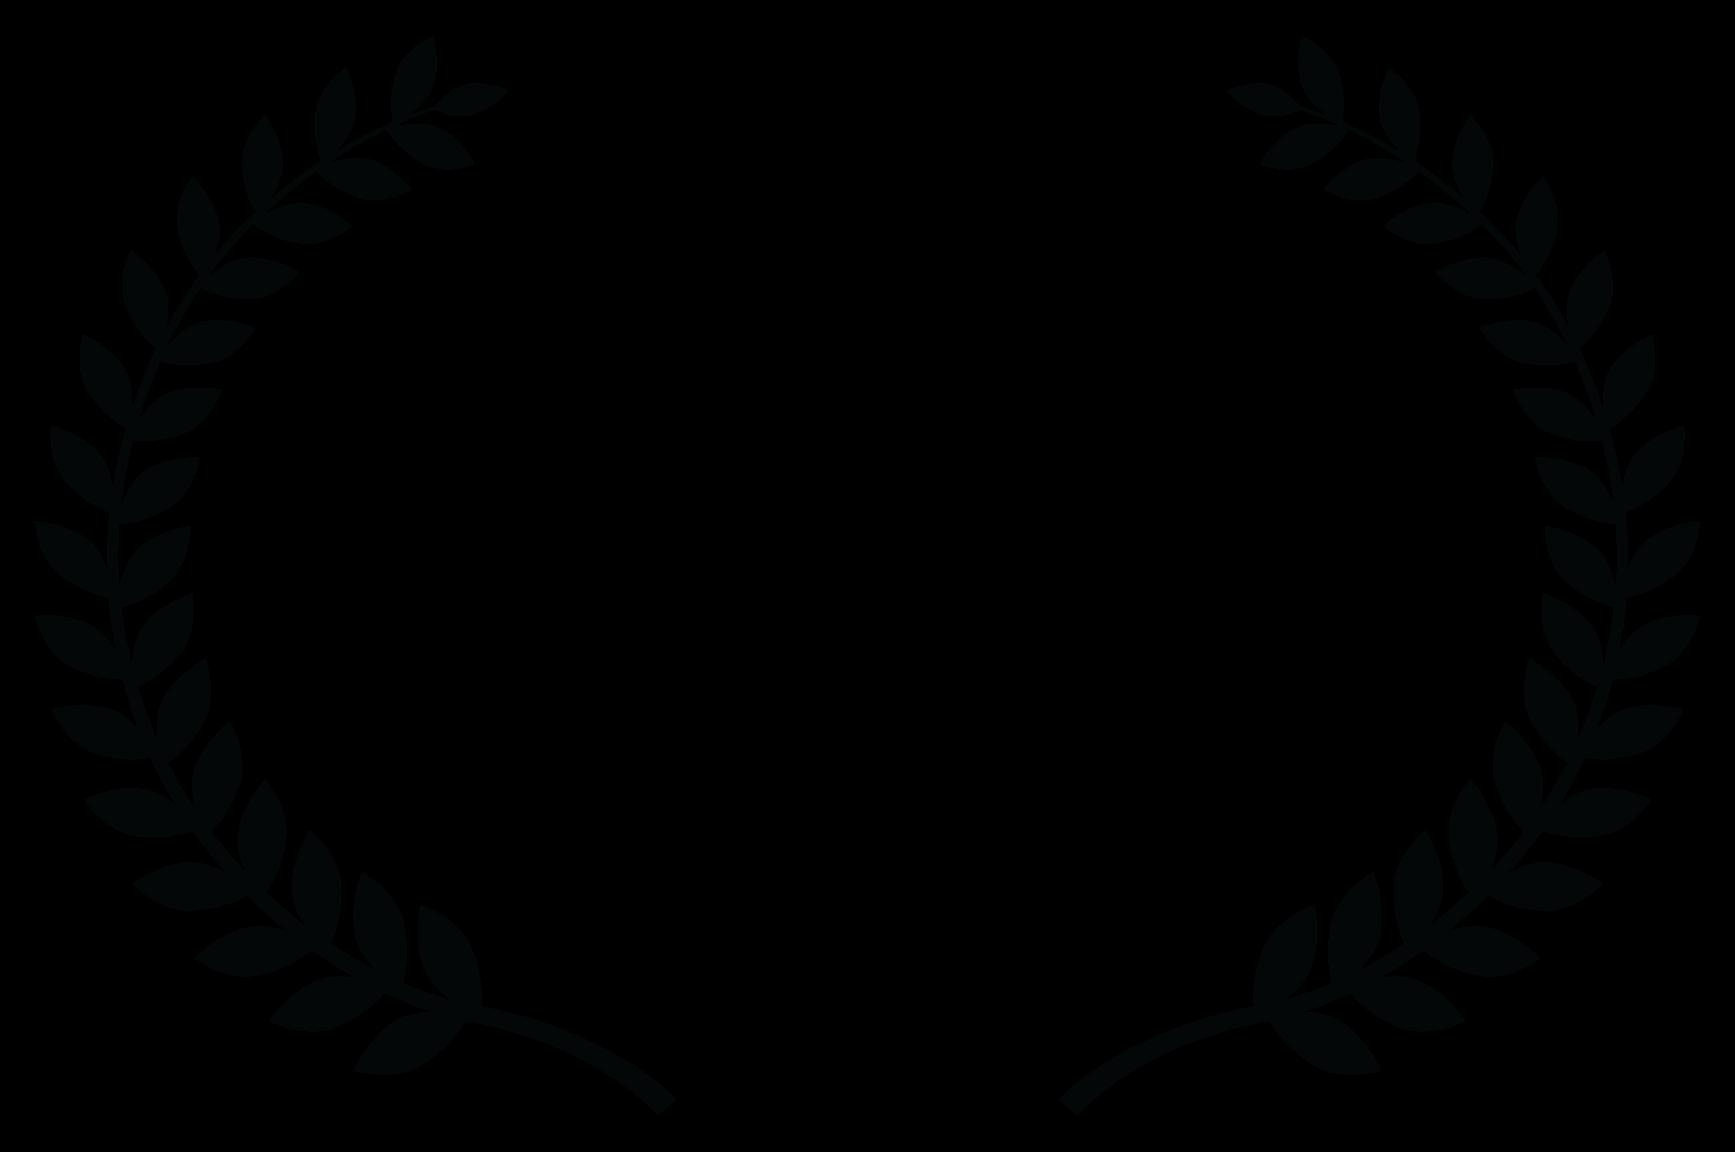 Brazilian Line - Filmuphigh Productions - Award winning film